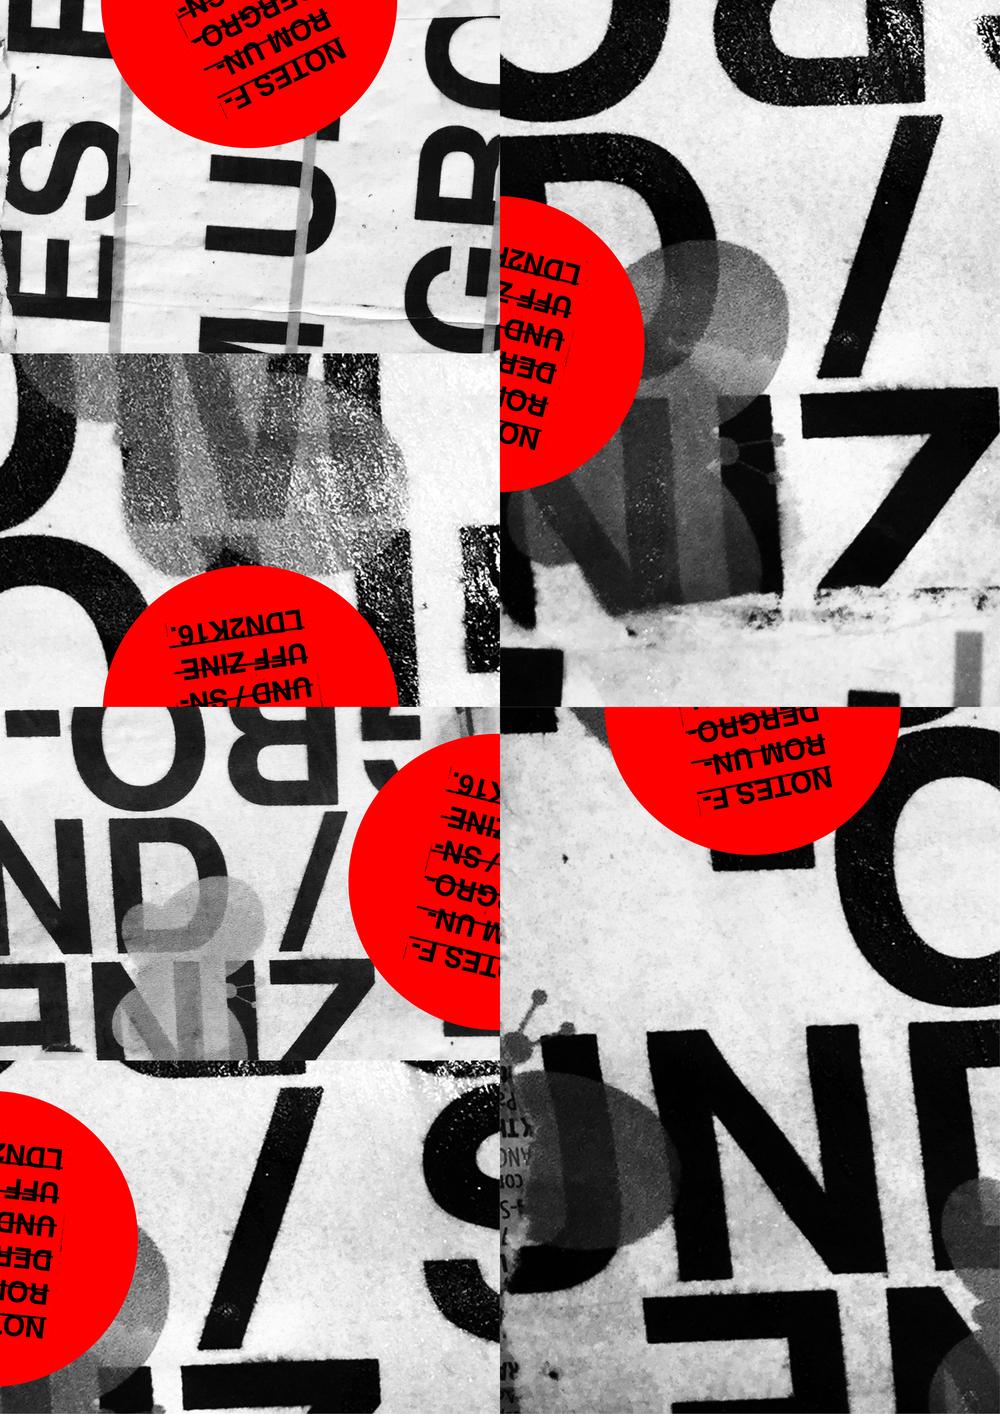 SNUFF ZINE \ NOTES FROM UNDERGROUND #PUNKLONDON